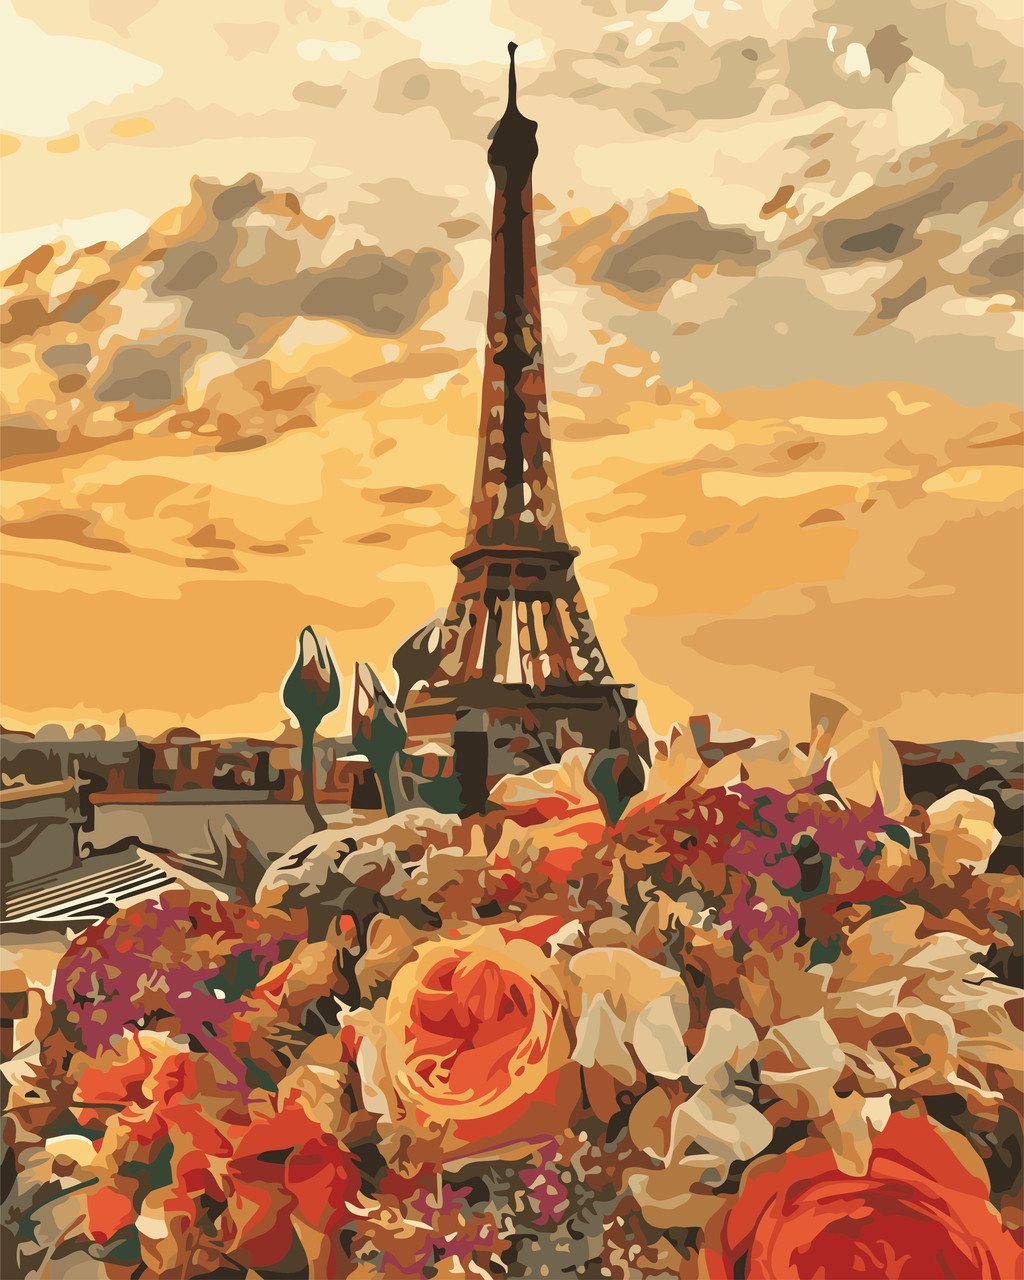 Художественный творческий набор, картина по номерам Вечерний Париж, 40x50 см, «Art Story» (AS0659)